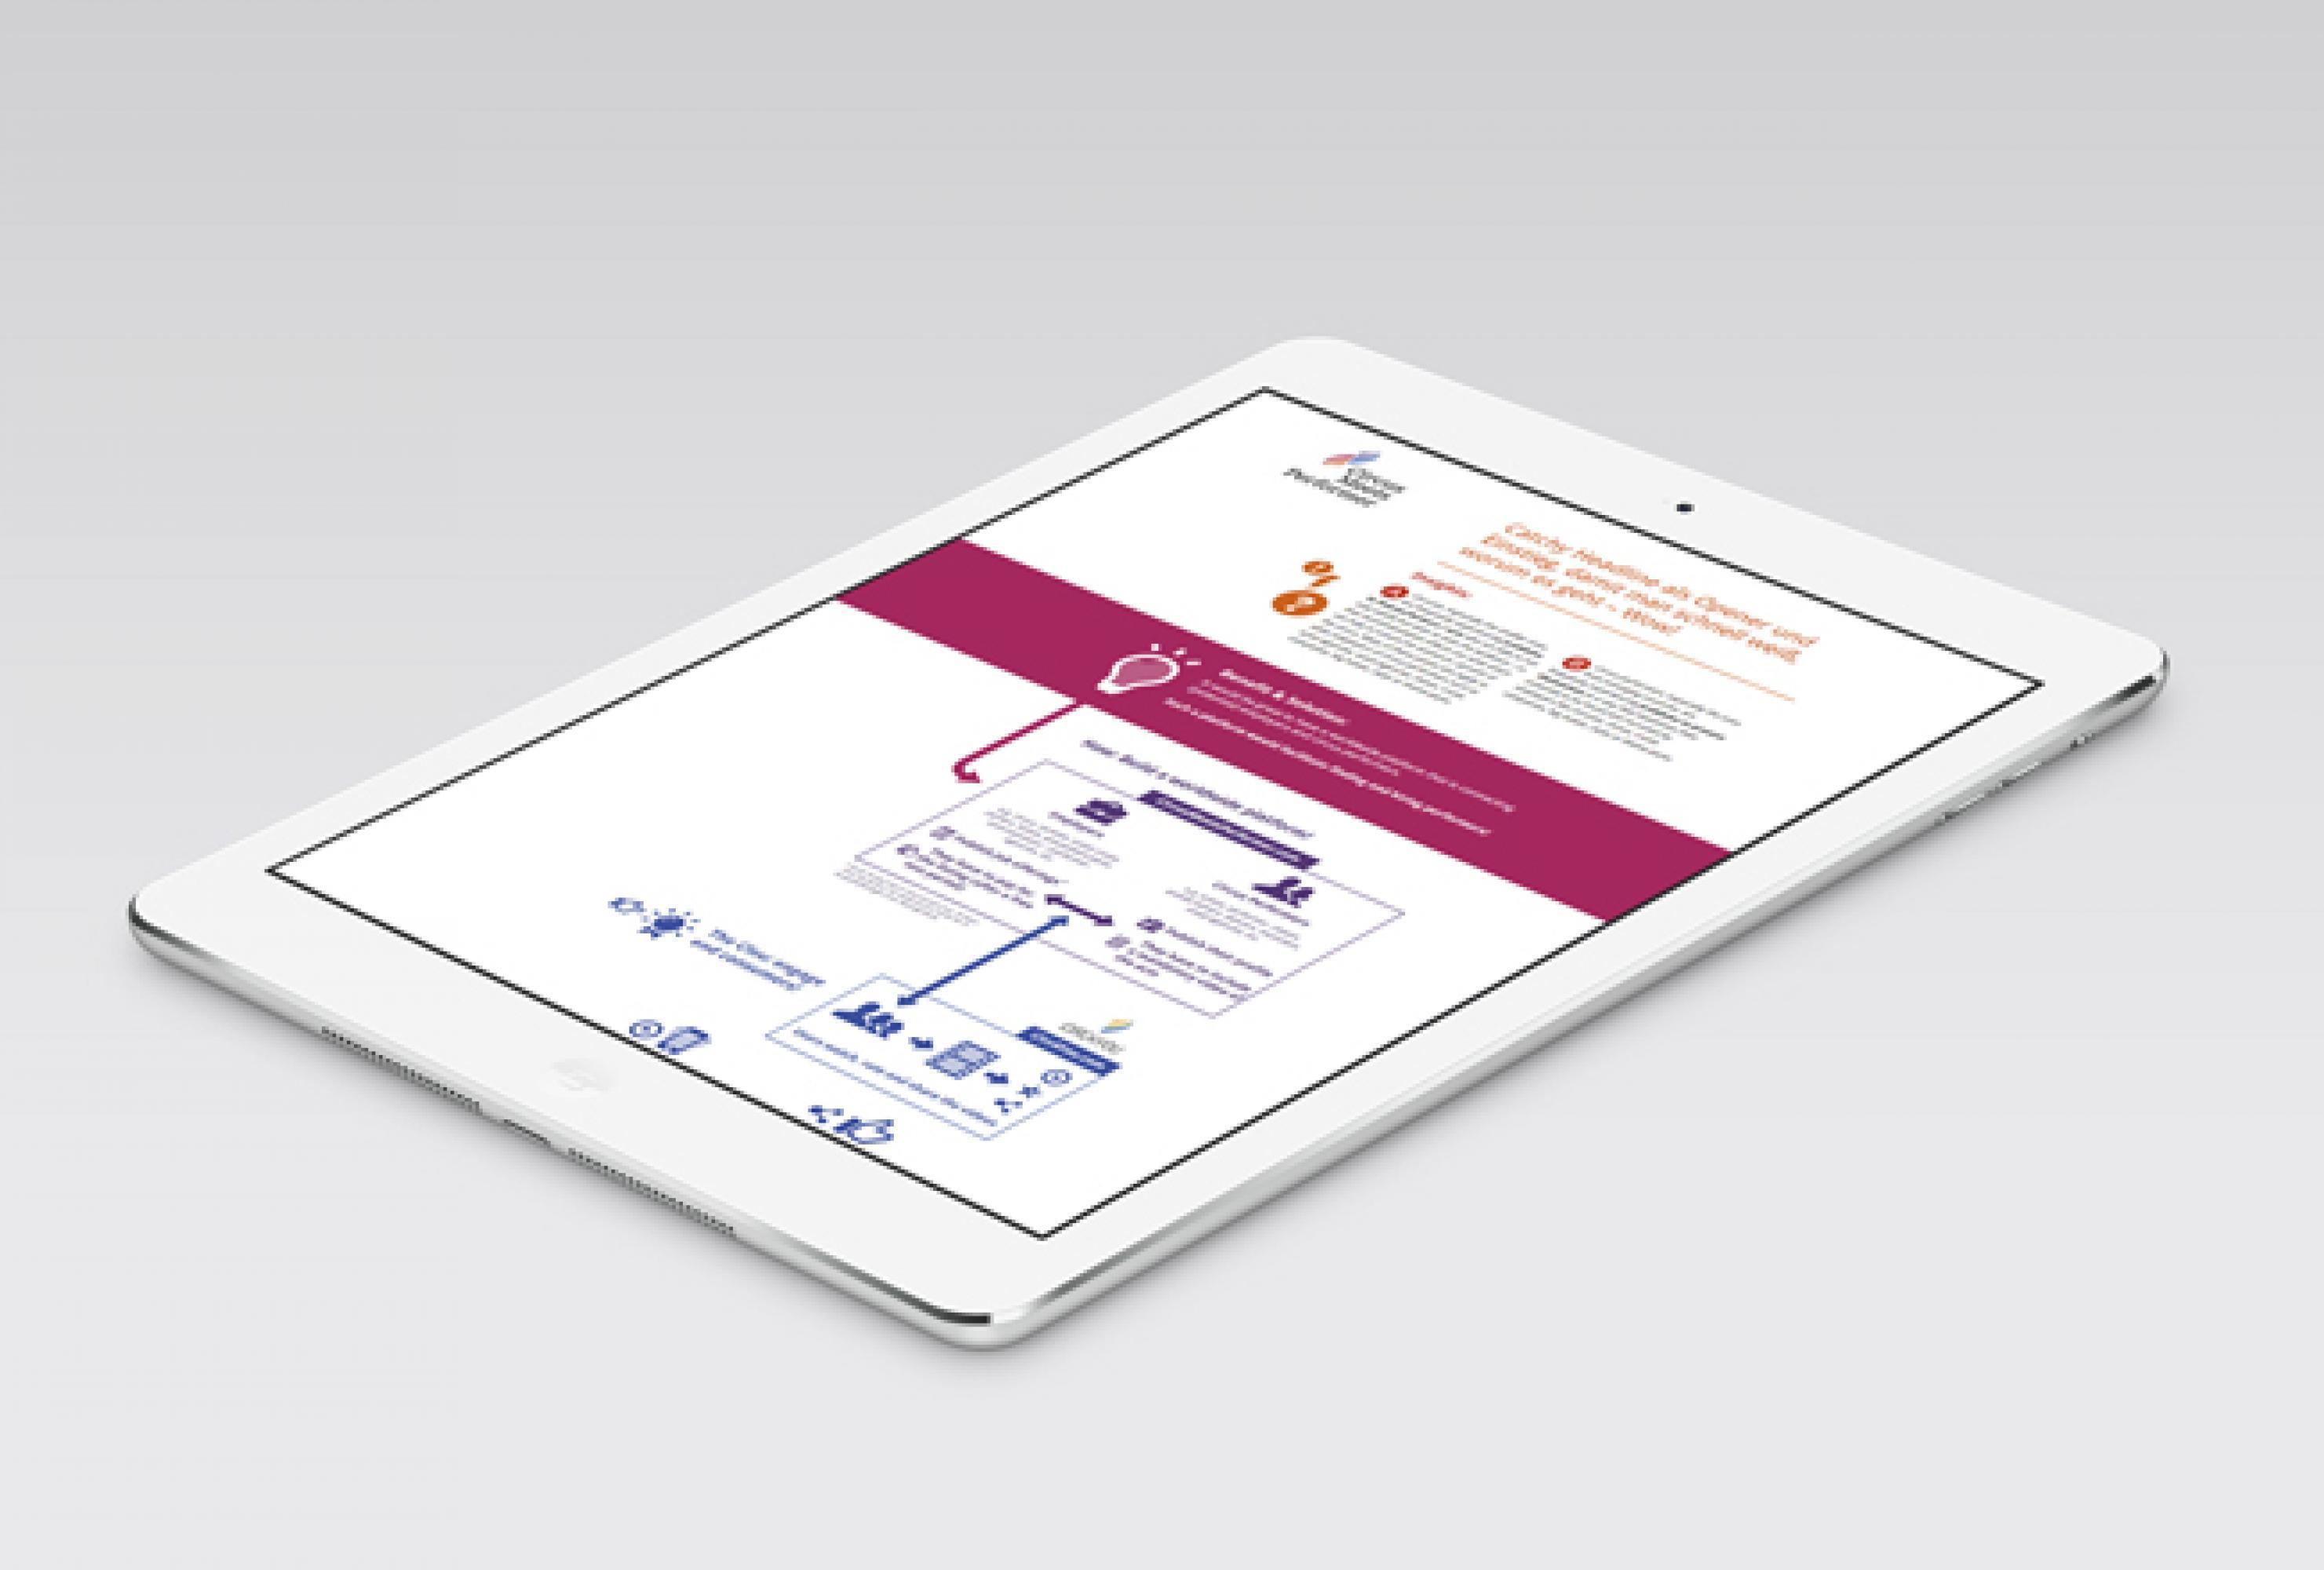 Corporate-Identity-Künstlerbranche-mobile-Webseite-Ipad